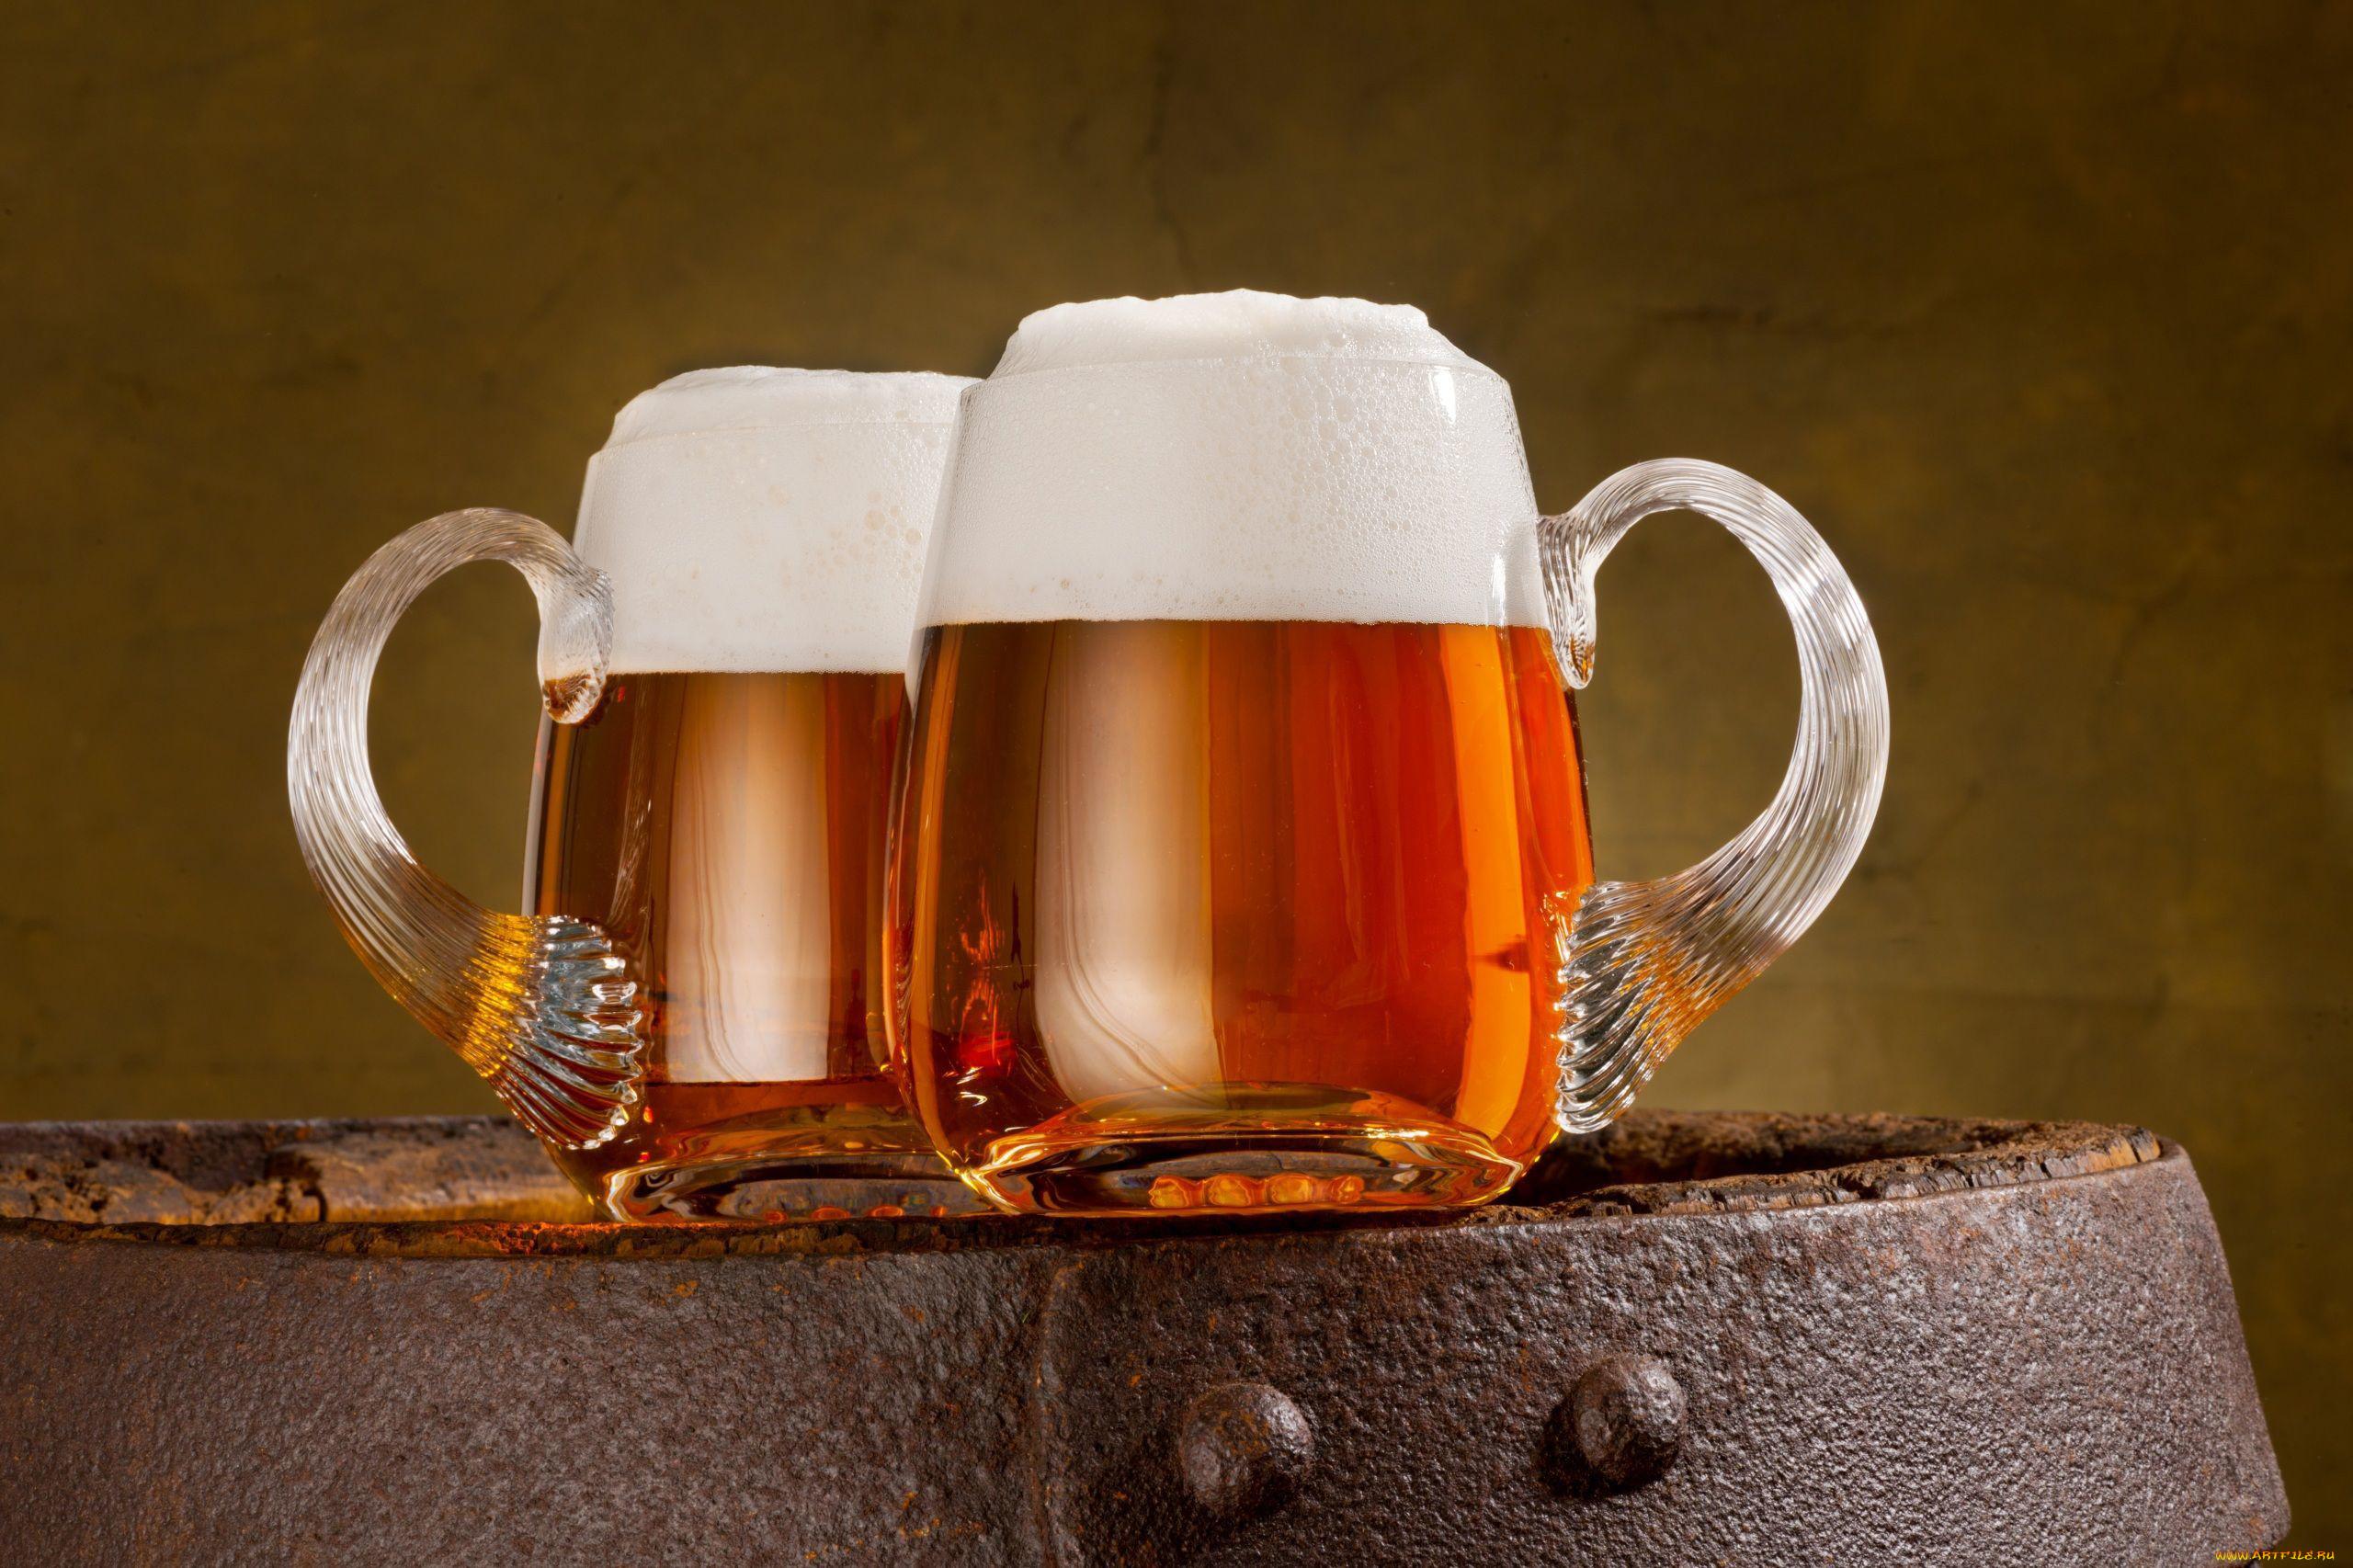 Красивое фото пиво в бокале